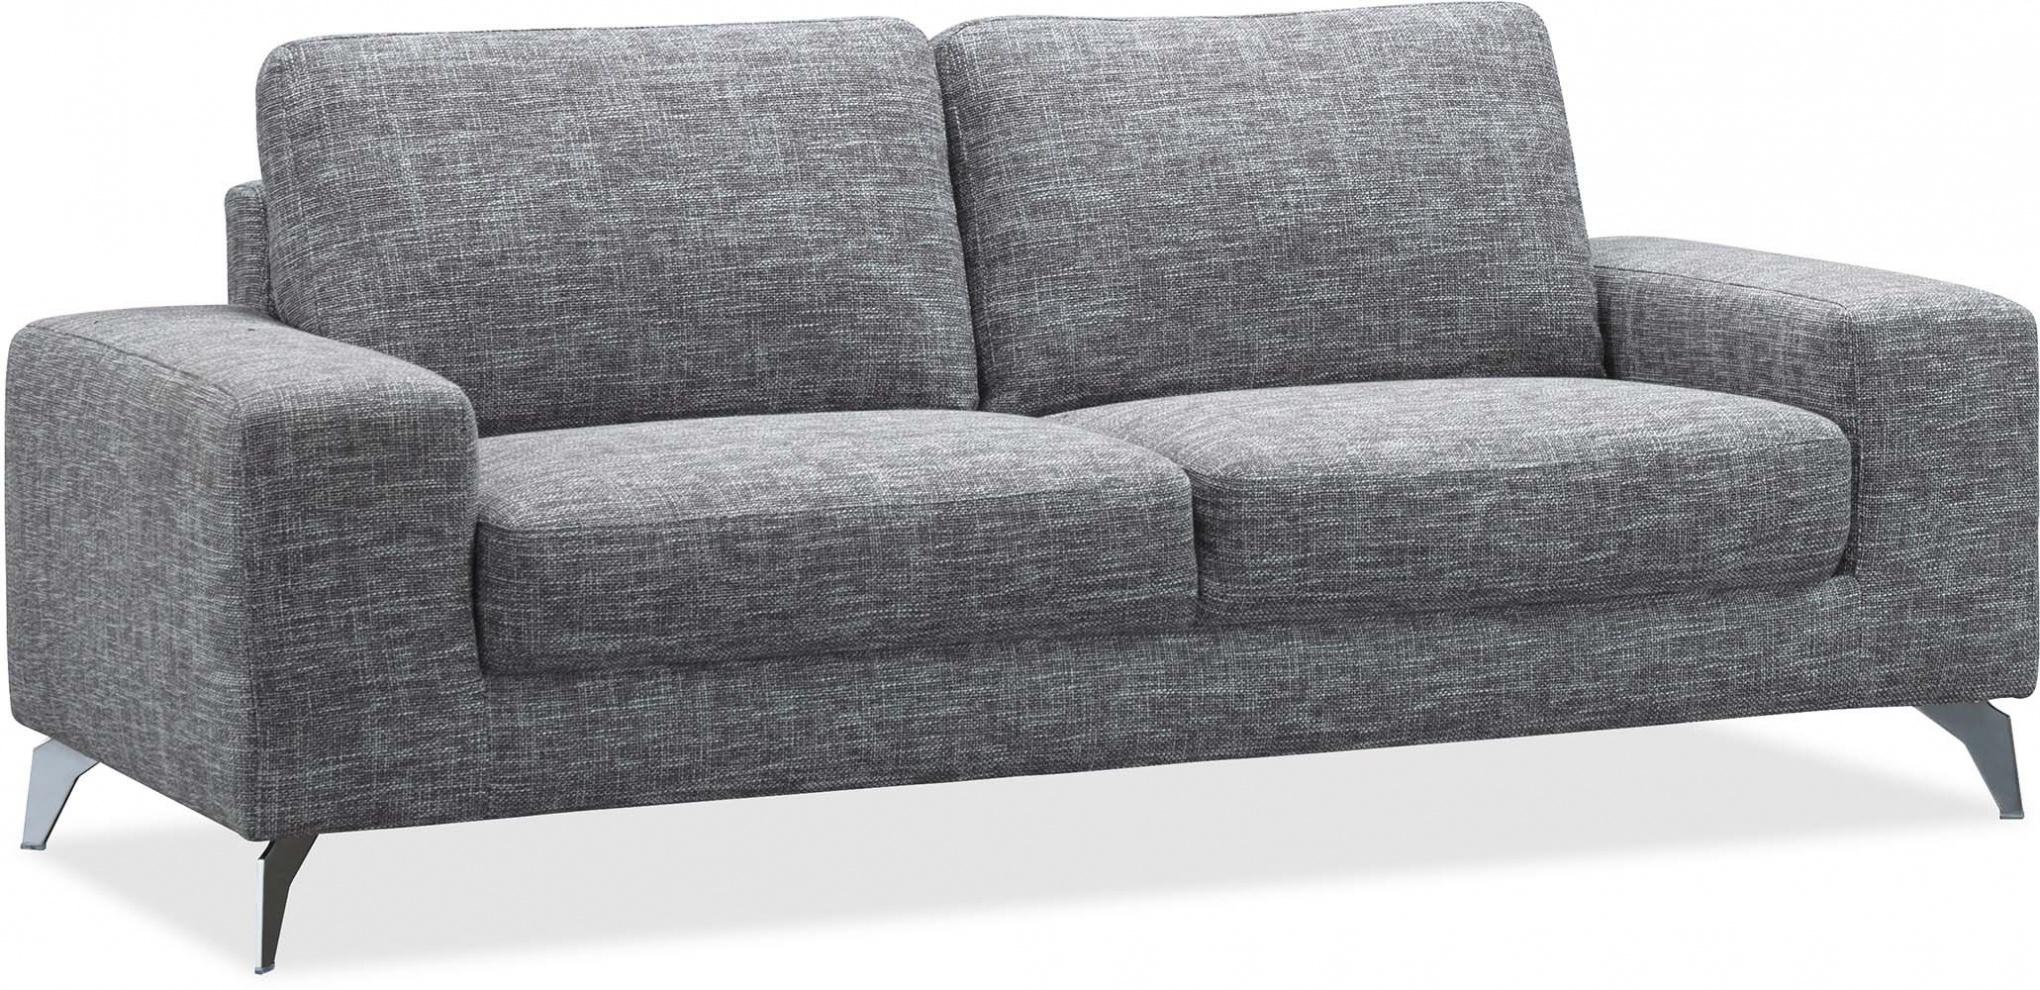 Canapé Arrondi Ikea Inspirant Collection Maha S Jeté De Canapé Gris Home Mahagranda